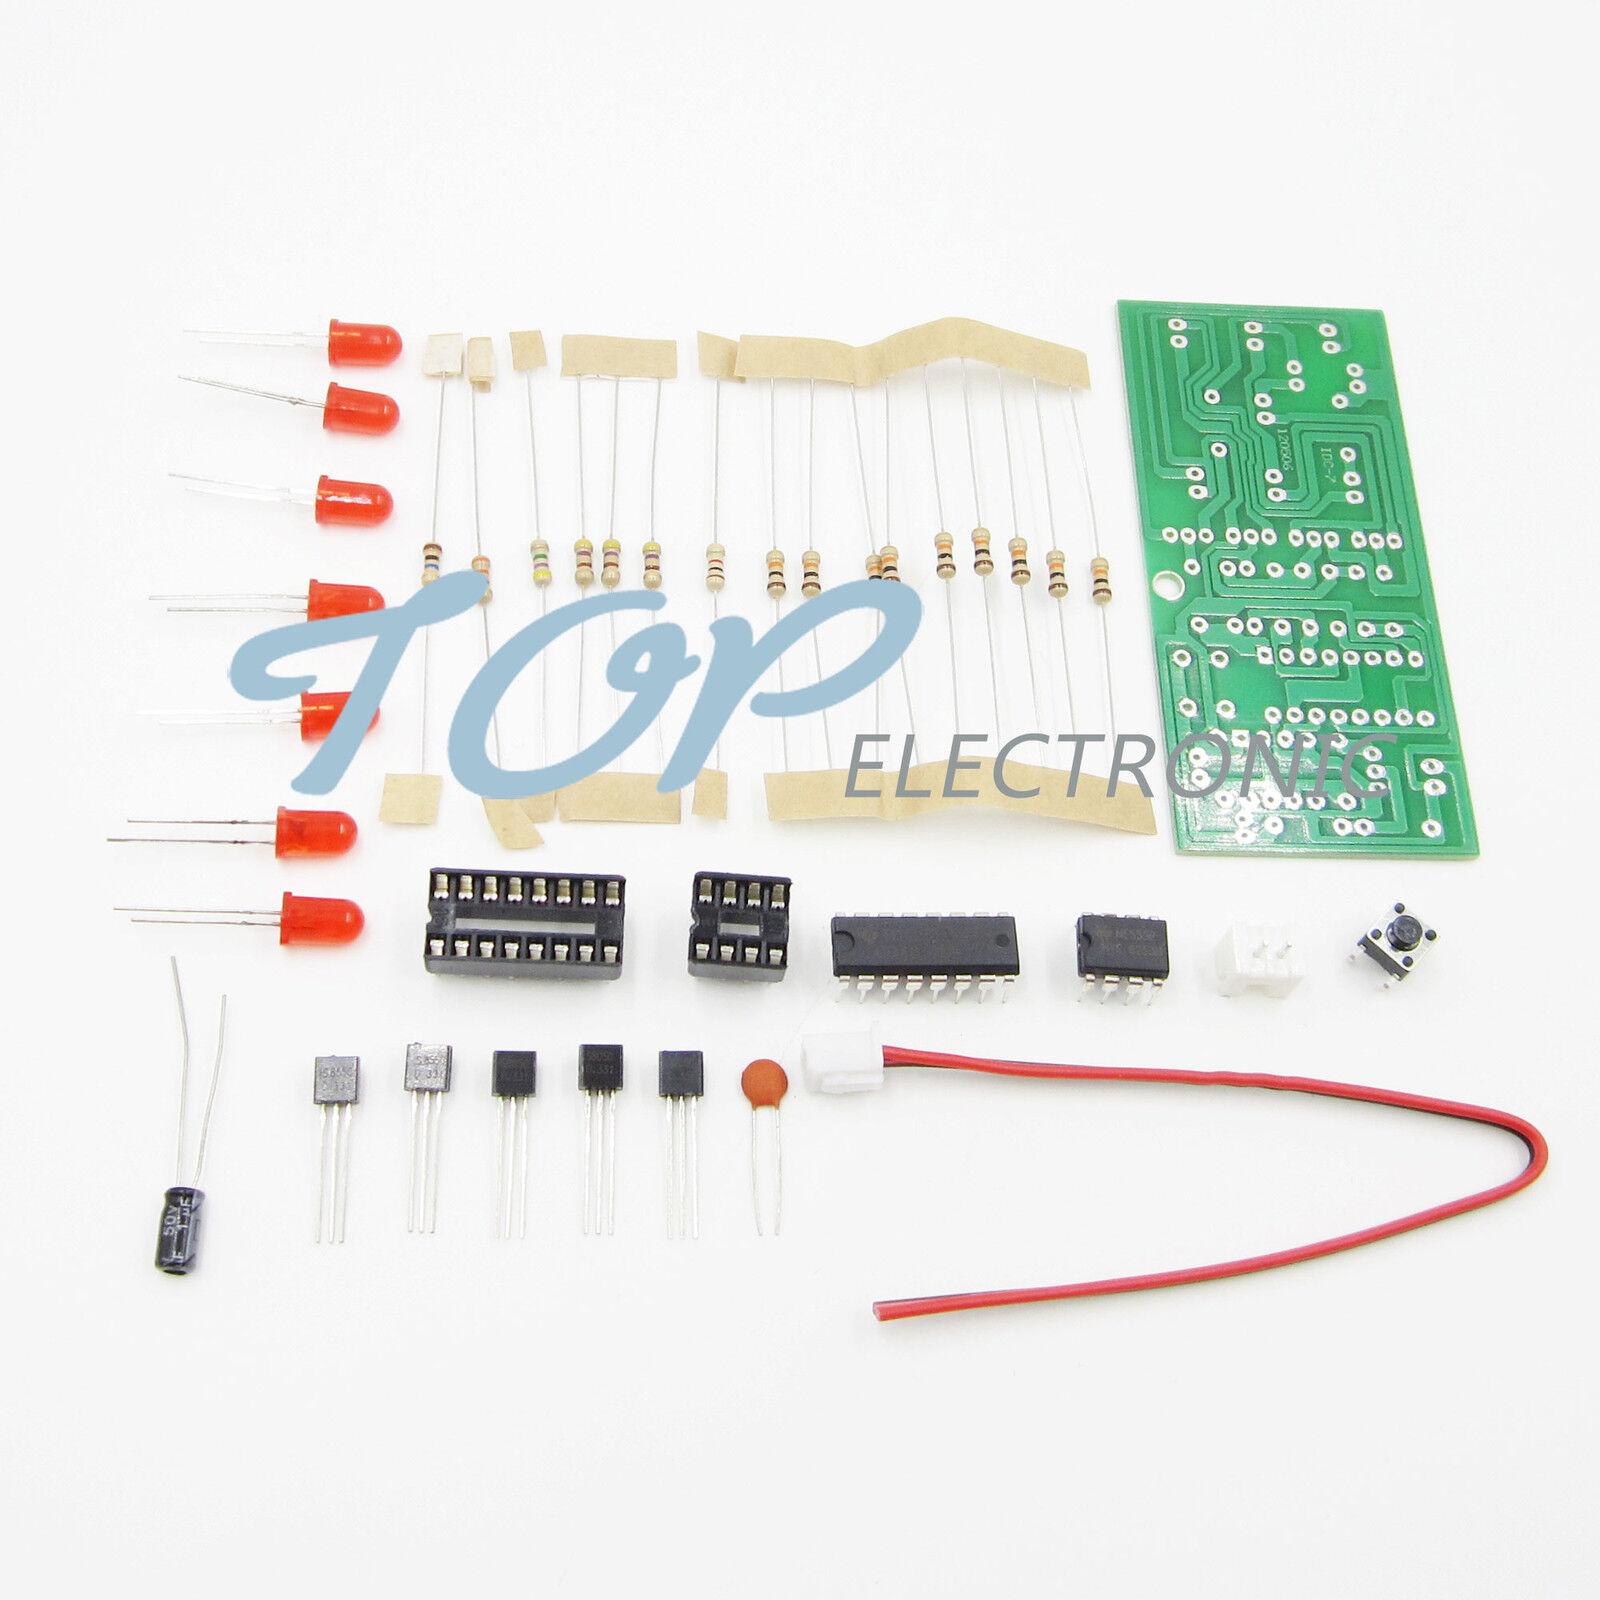 Electronic dice NE555 CD4017 DIY kit 5mm Red led 4.5-5V ICSK057A Electronic Fun